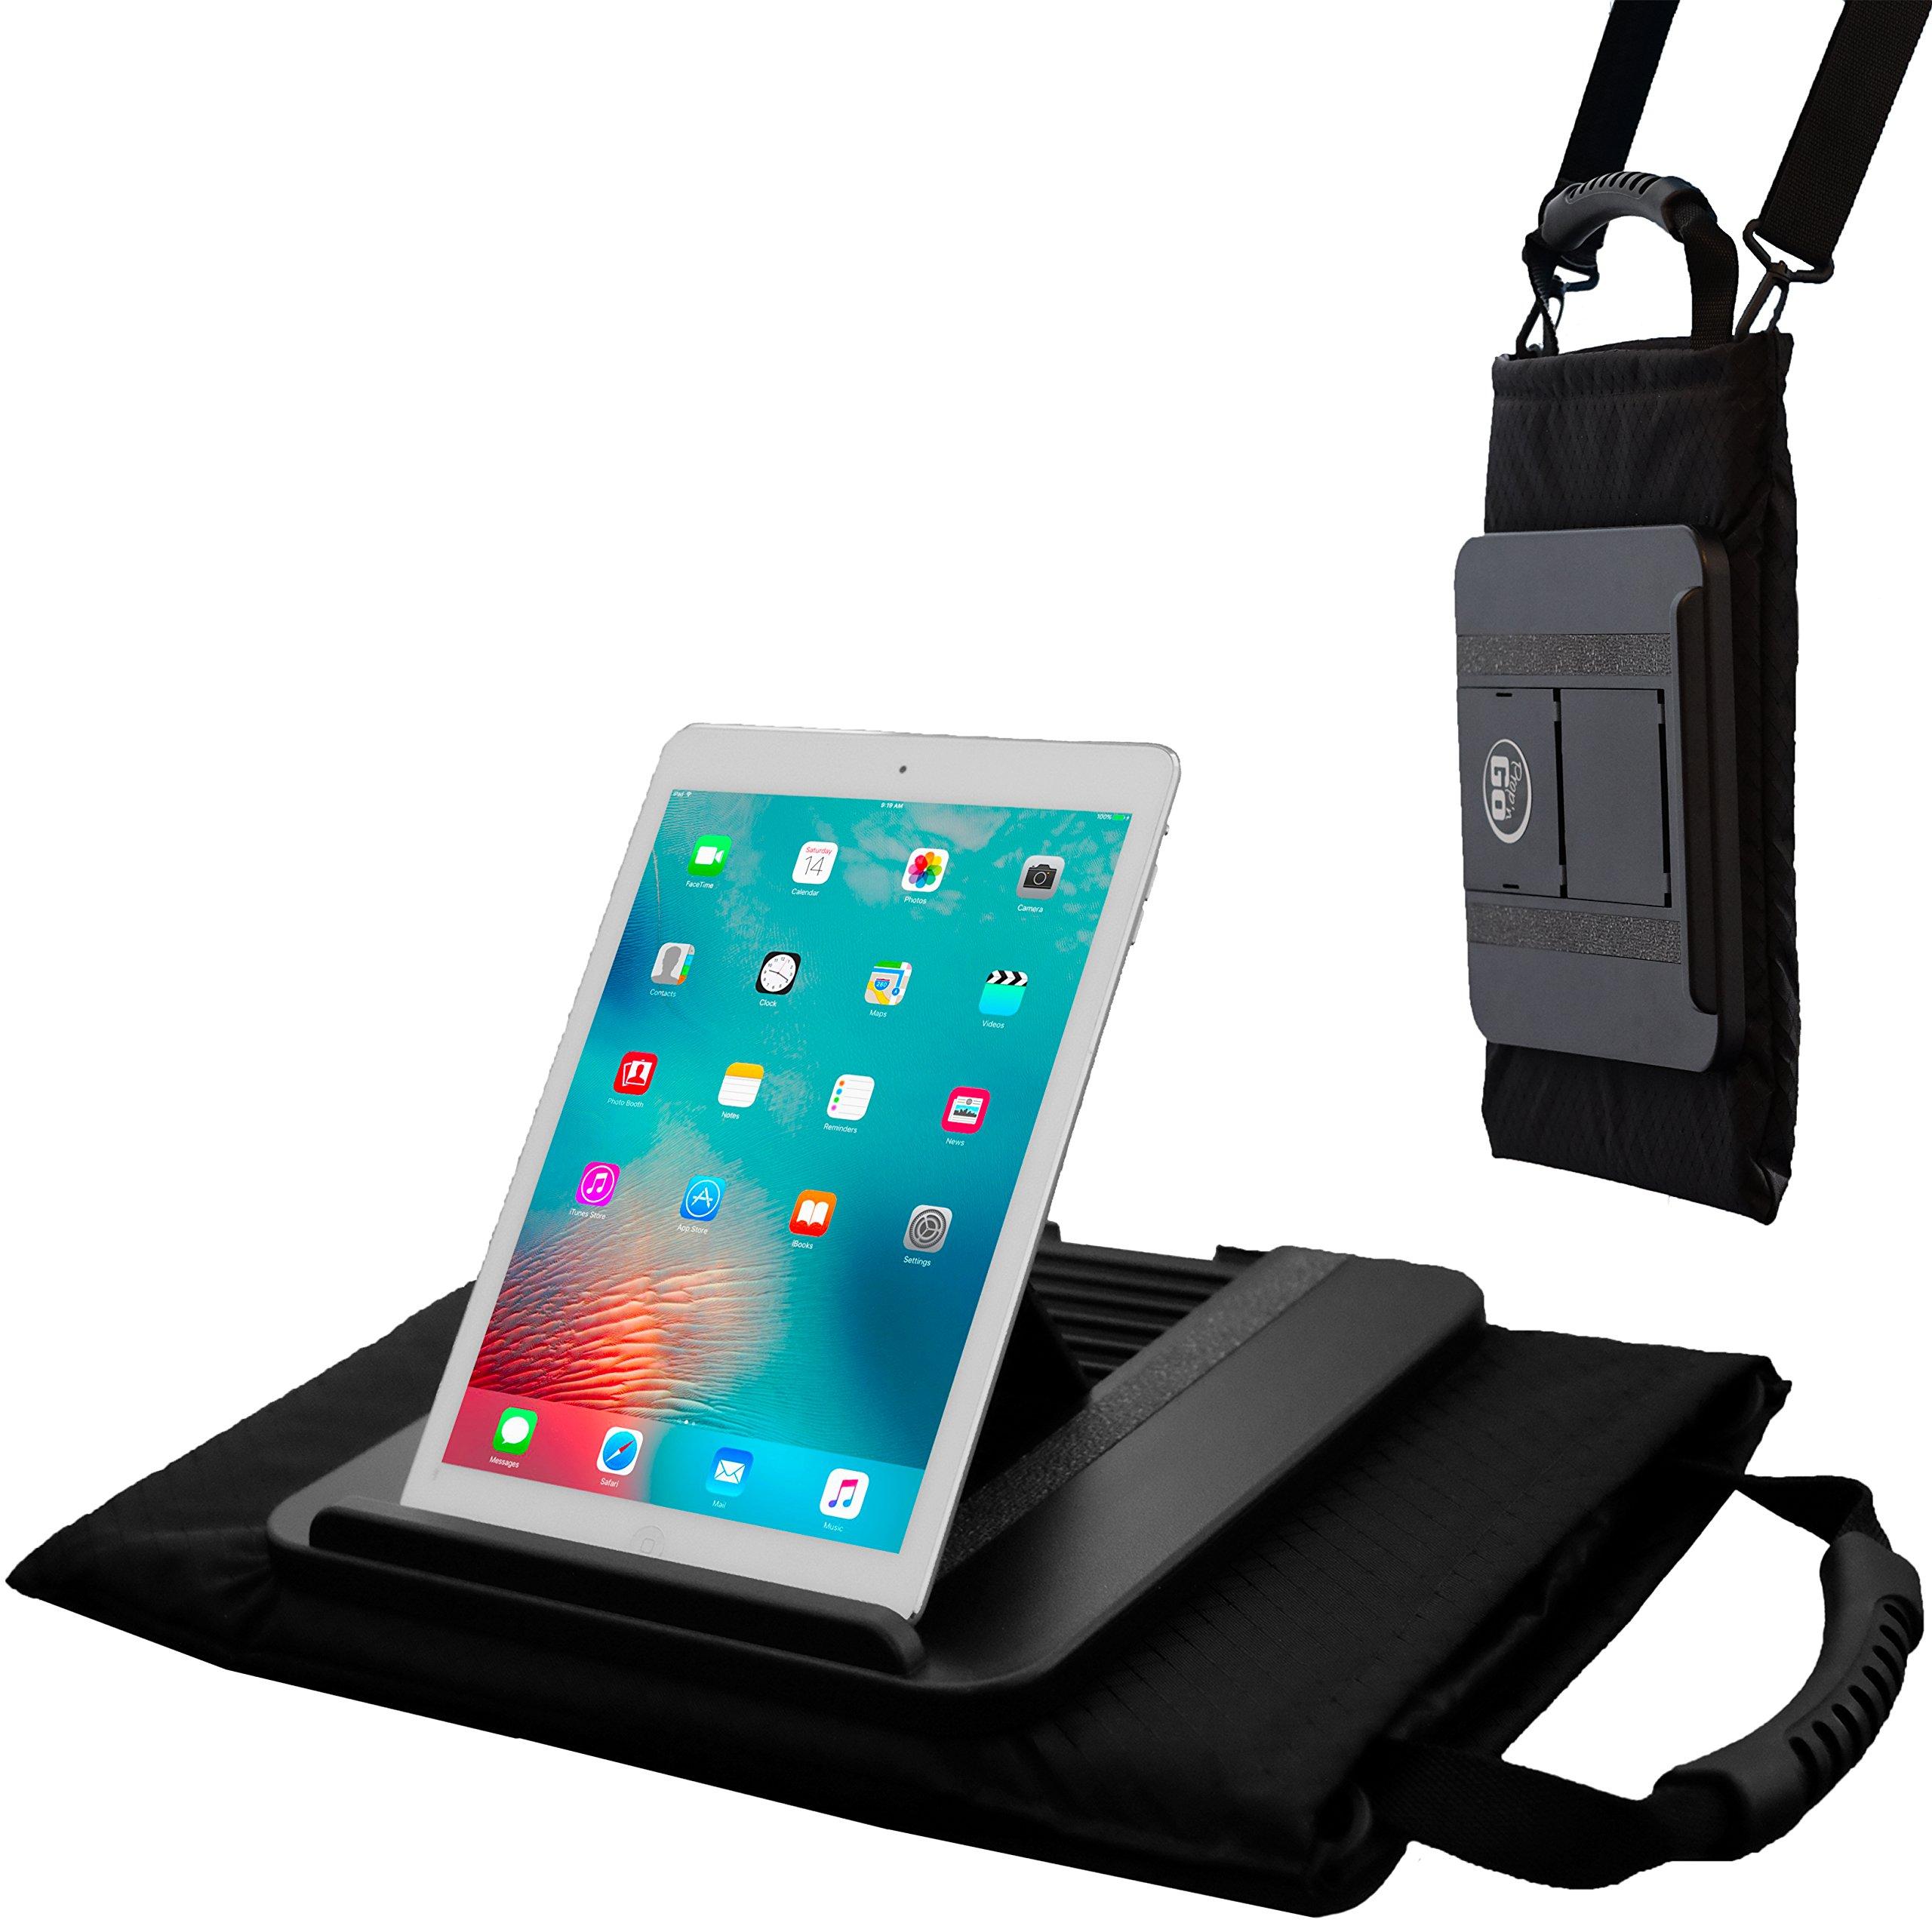 Prop 'n Go Tote // XL Multi-Angle Lap Desk + Messenger Bag // Pillow Base // Built-in Handle & Shoulder Strap // Storage Pockets & Stylus Holder // for iPad (Air,Mini,Pro), iPhone, MacBook & Tablets